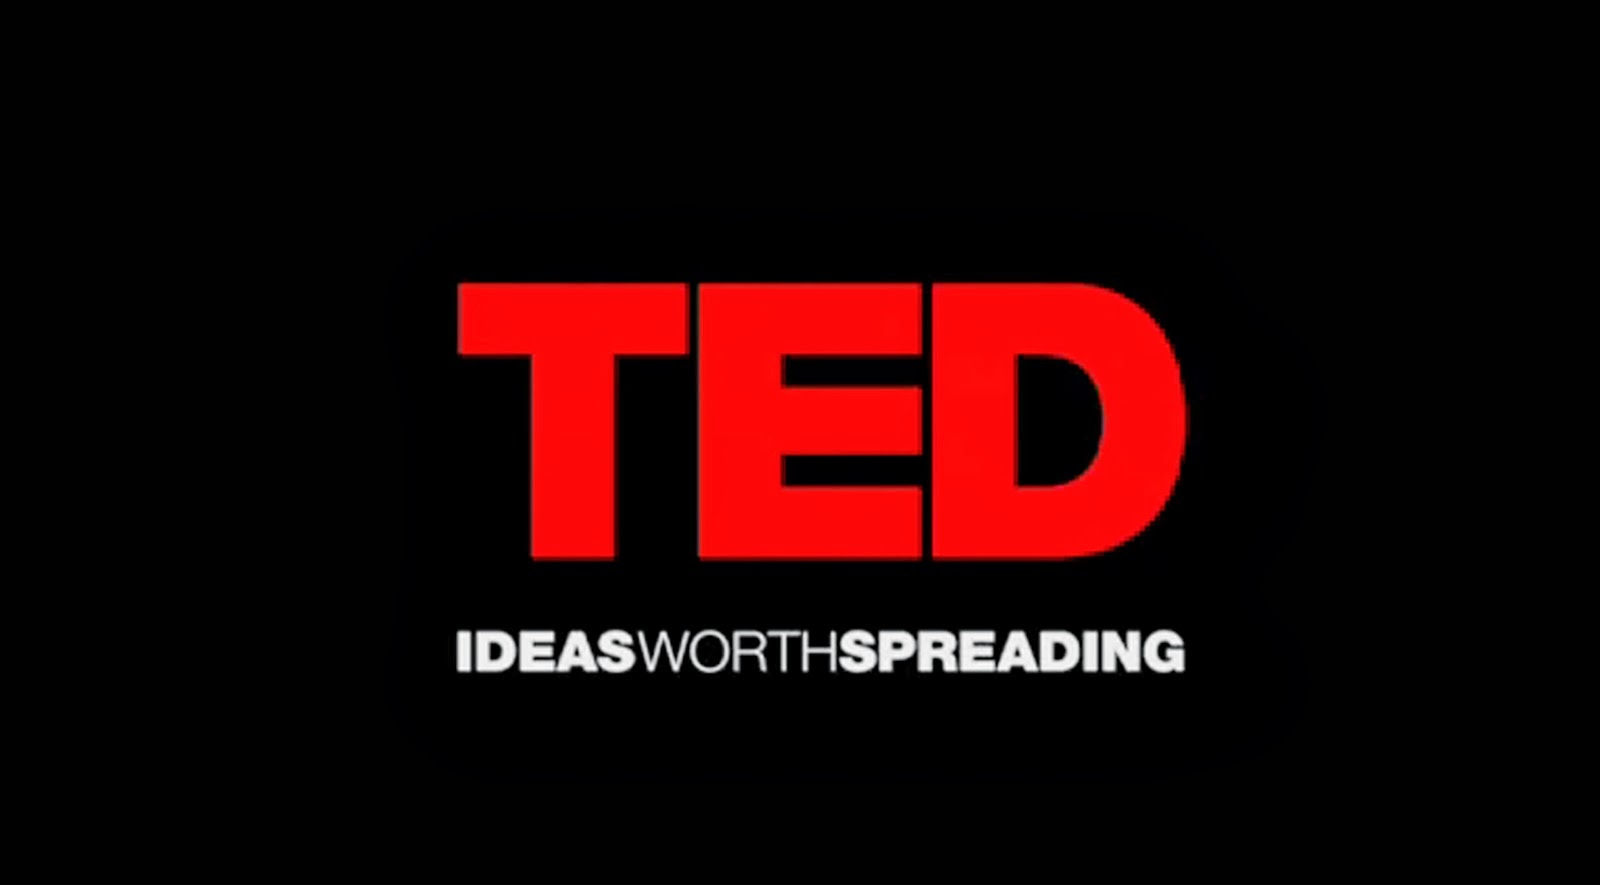 ted logo ted talks tedx